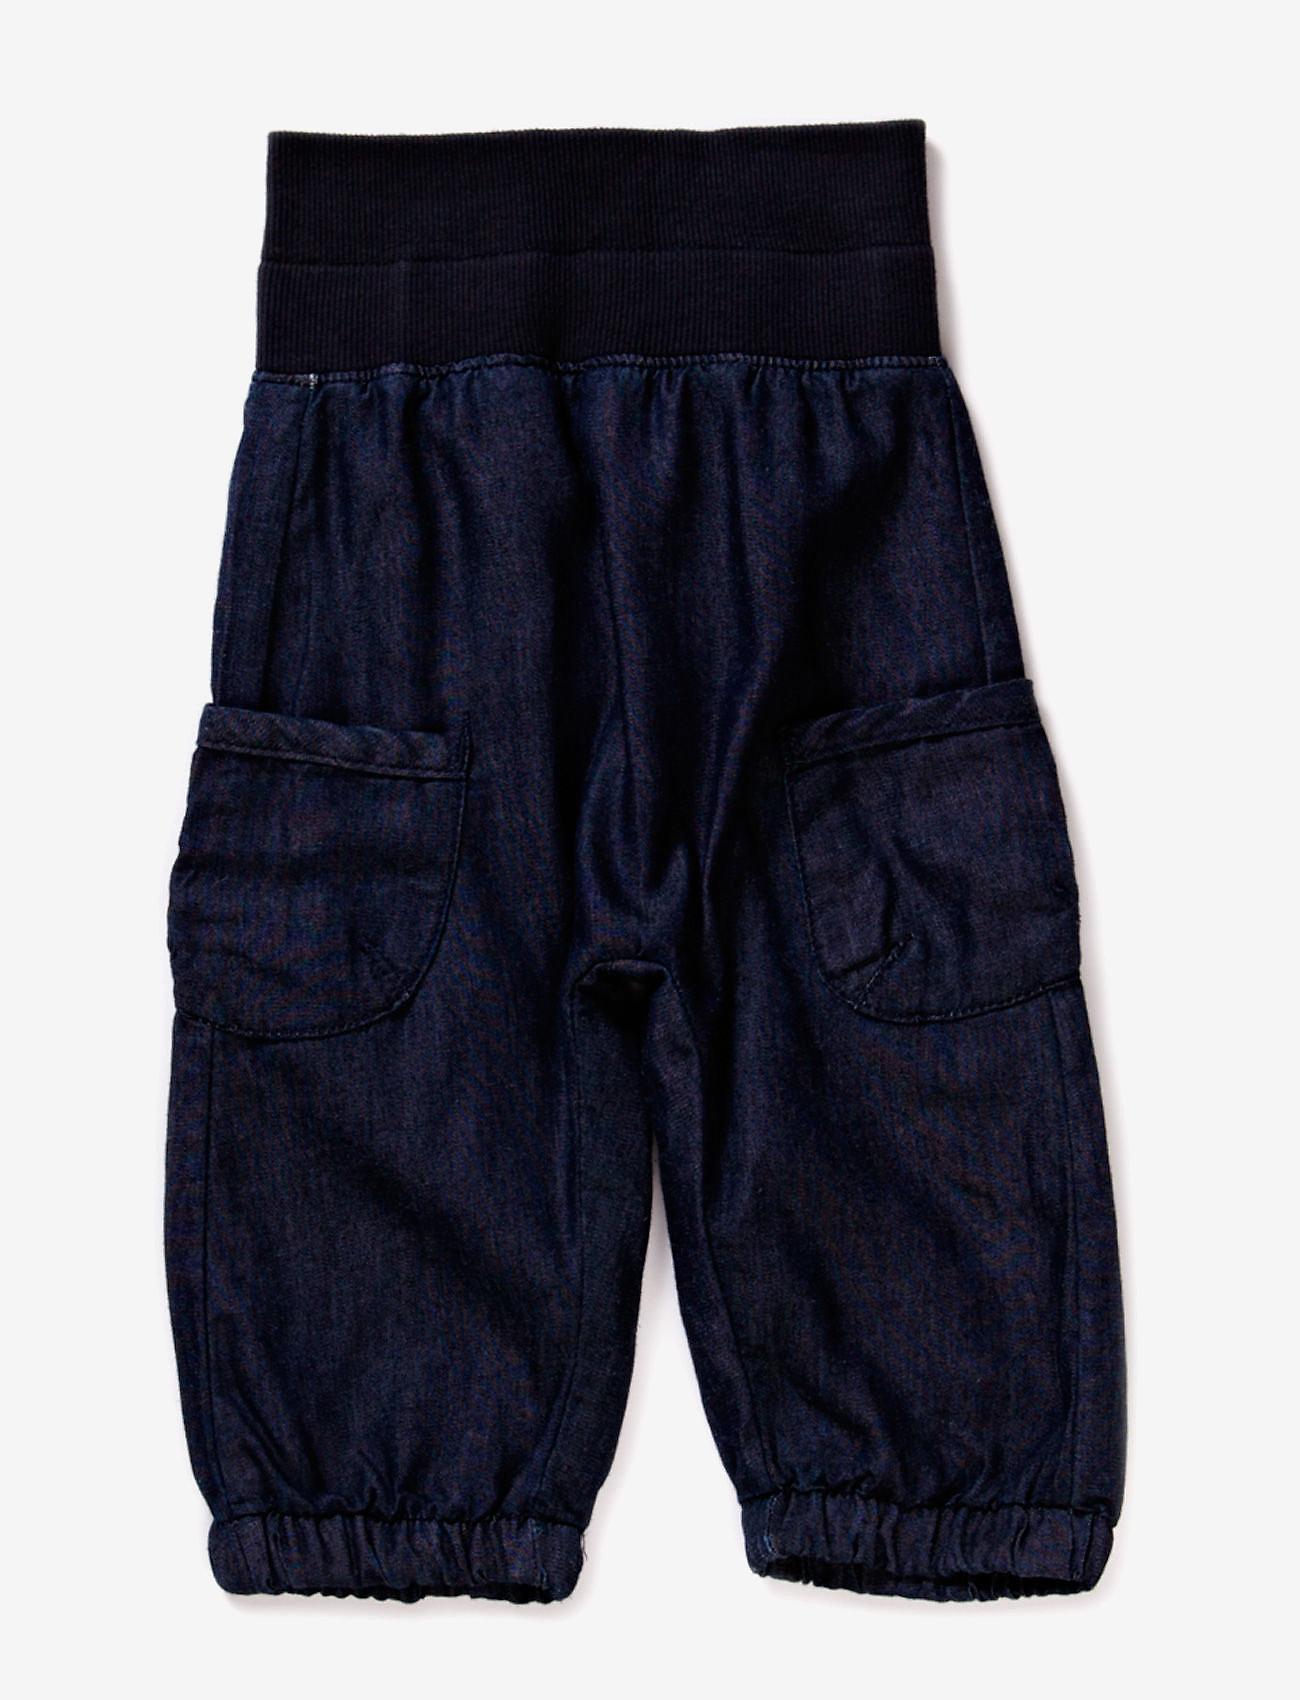 Minymo - Baggy pants -UNISEX - trousers - dark blue - 0